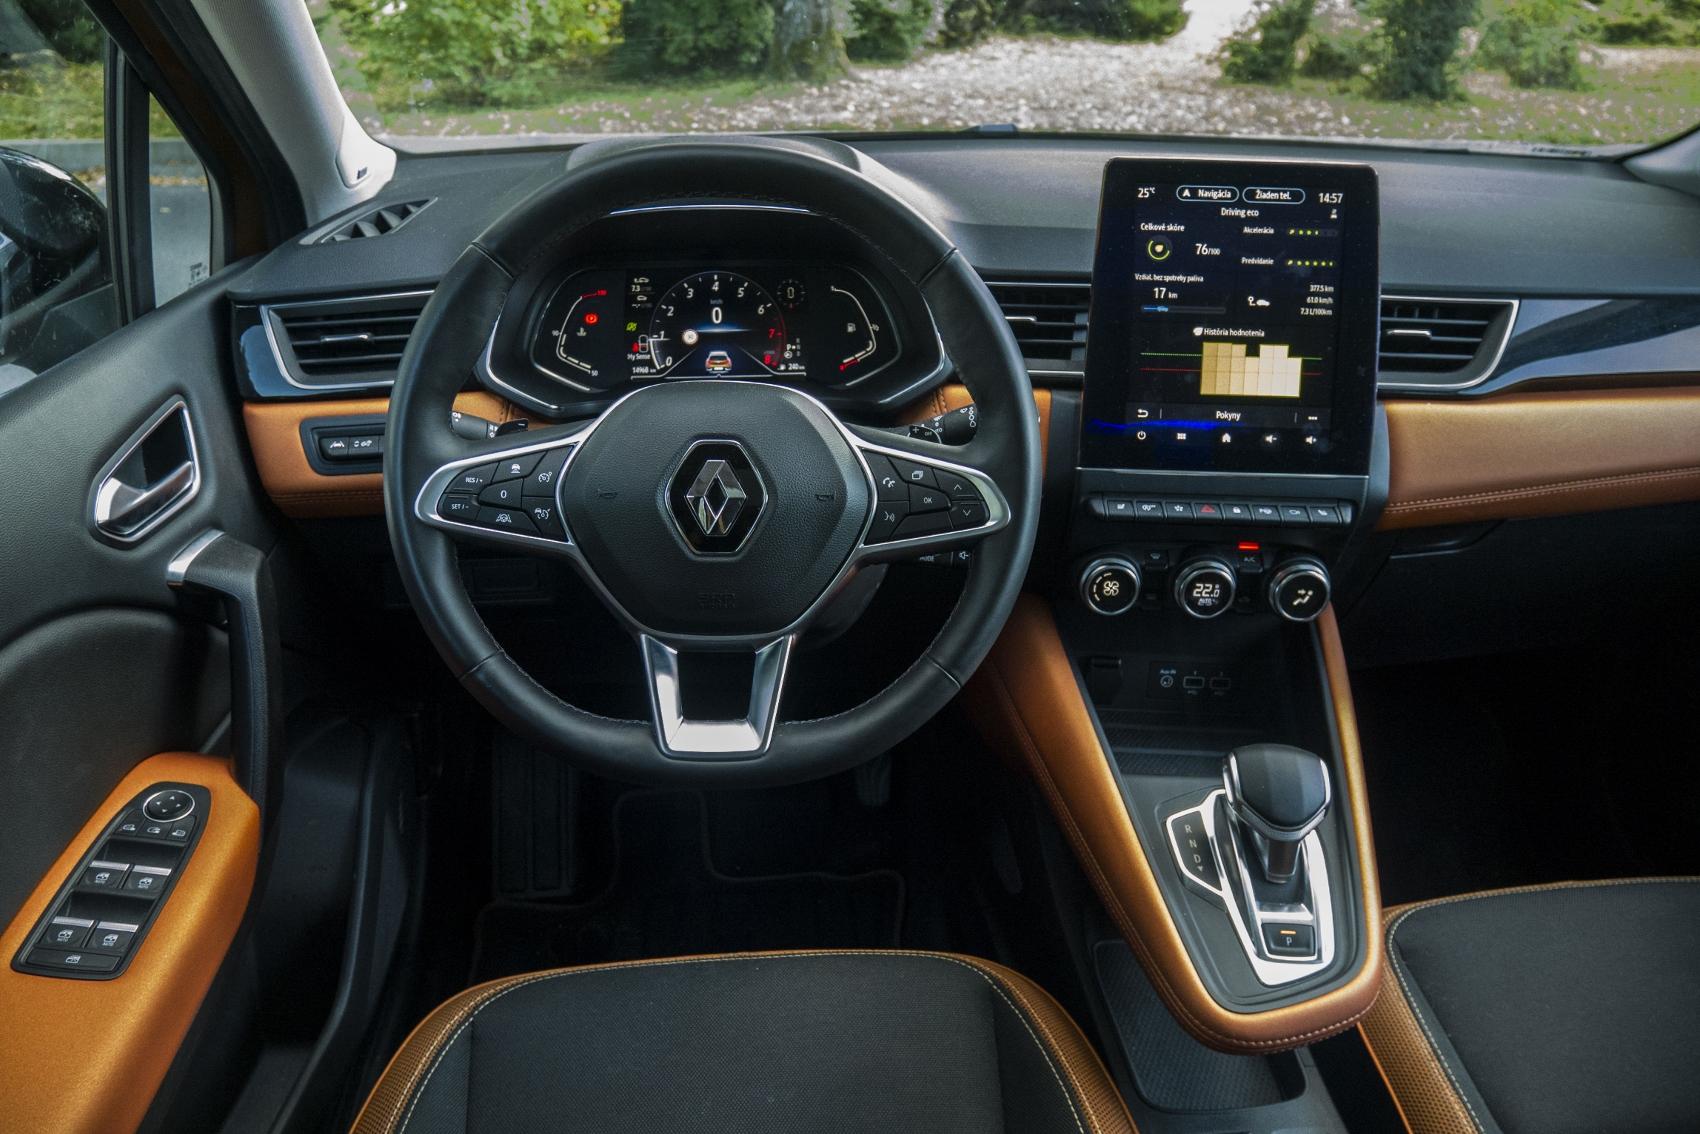 Test: V interiéri sa Renault Captur tvári ako o triedu drahšie auto hn3IhIsHSN renault-captur-24